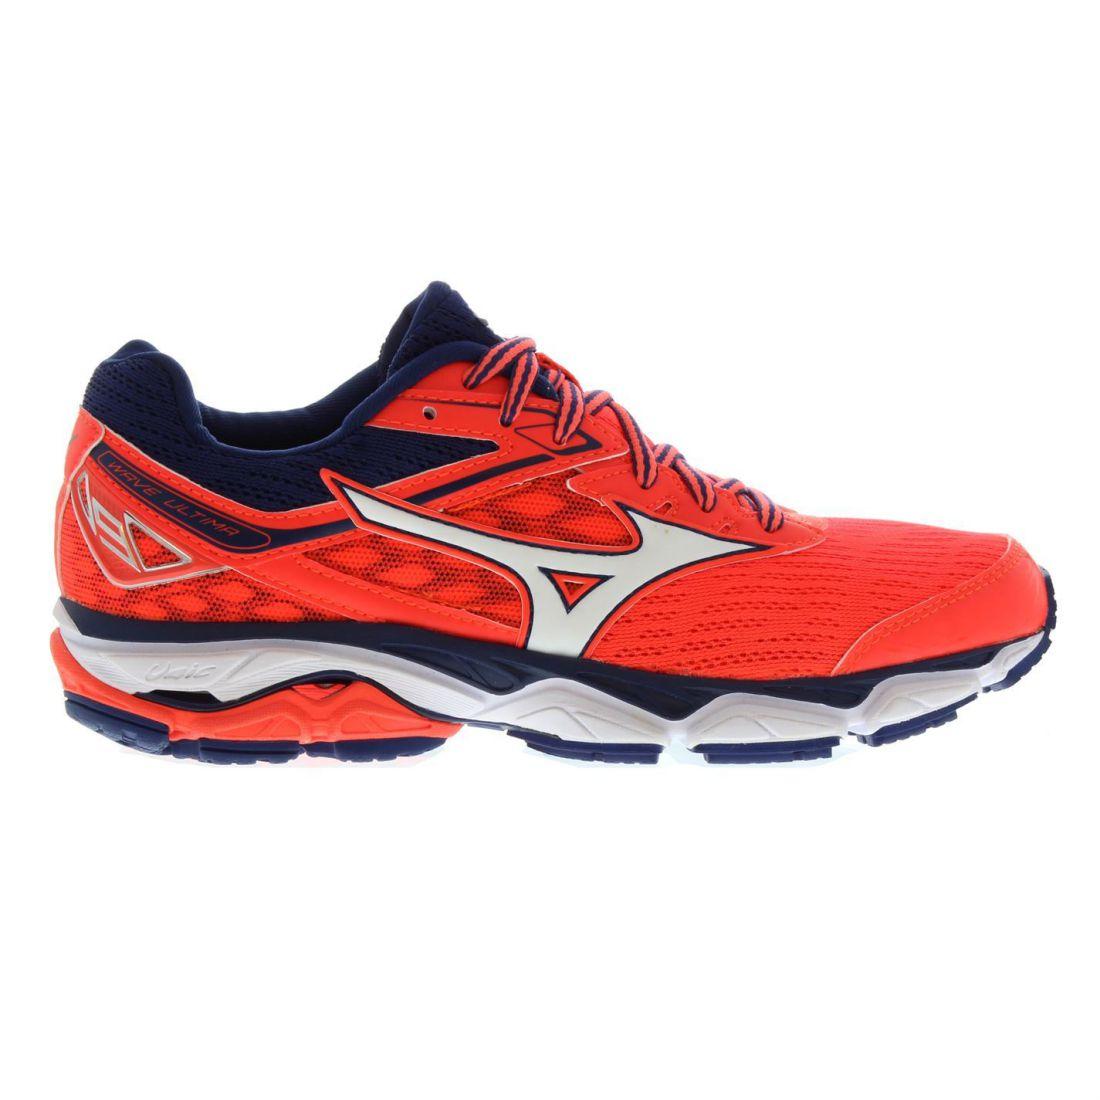 58f6cfb969ca Mizuno-Womens-Wave-Ultima-9-Running-Shoes-Road thumbnail